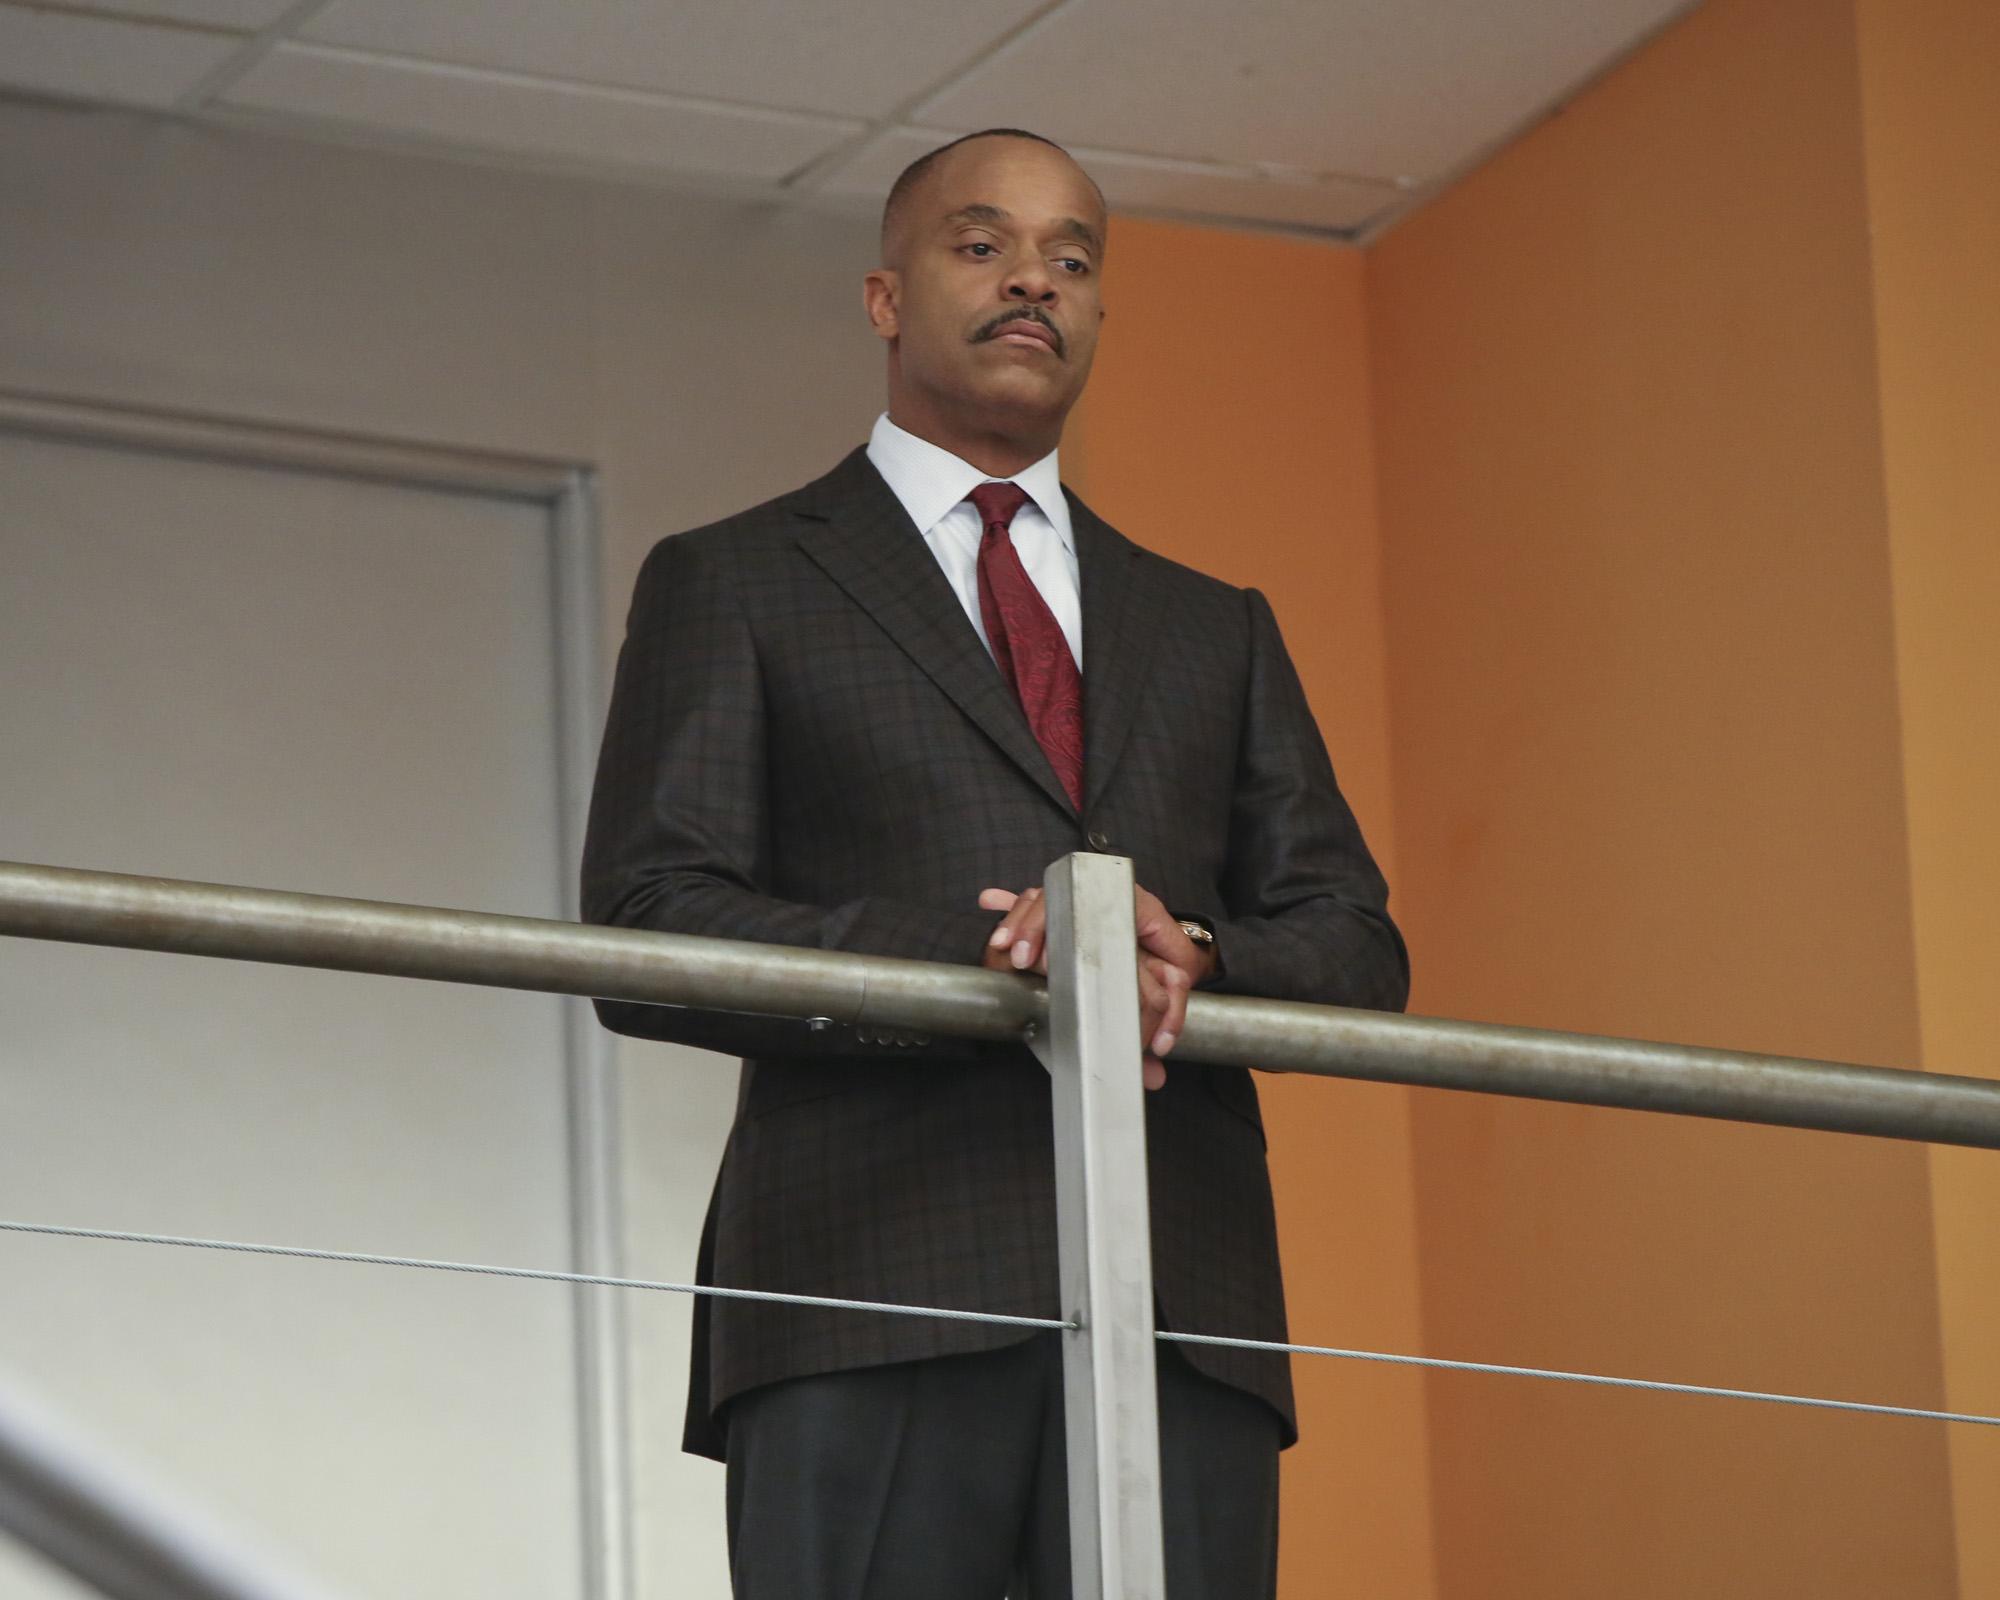 Rocky Carroll as Leon Vance.